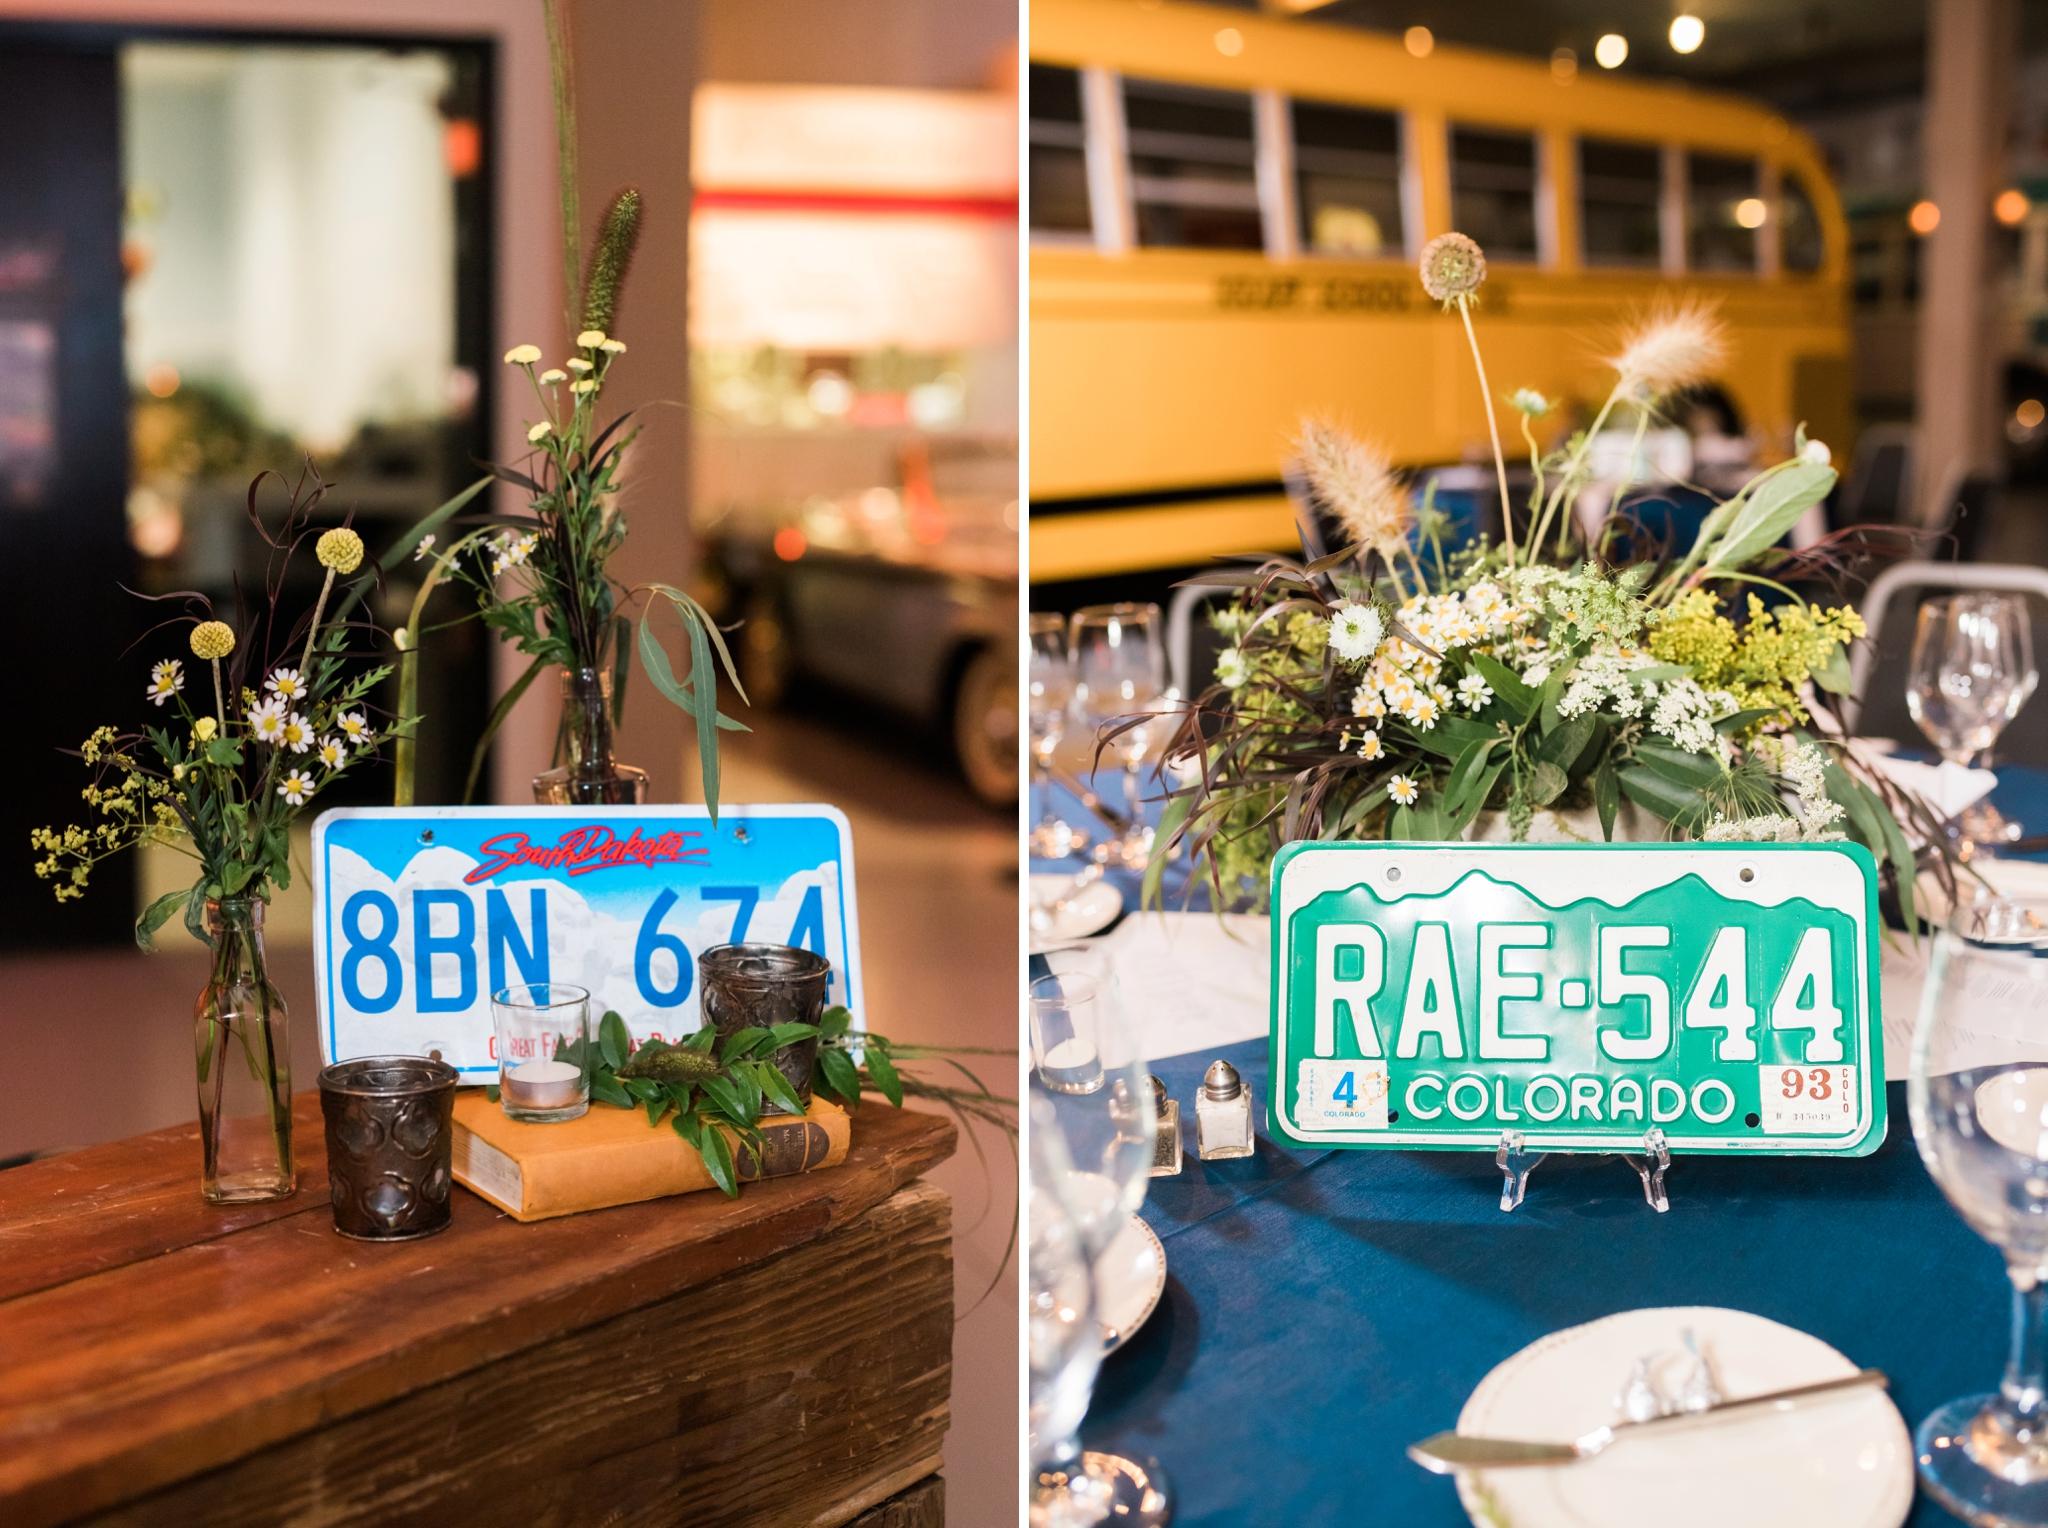 Emily Grace Photography, Lancaster PA Wedding Photographer, AACA Museum Wedding, Hershey PA, Same Sex Couple Wedding, Classic Car Wedding, Antique Car Wedding, Car Theme Wedding